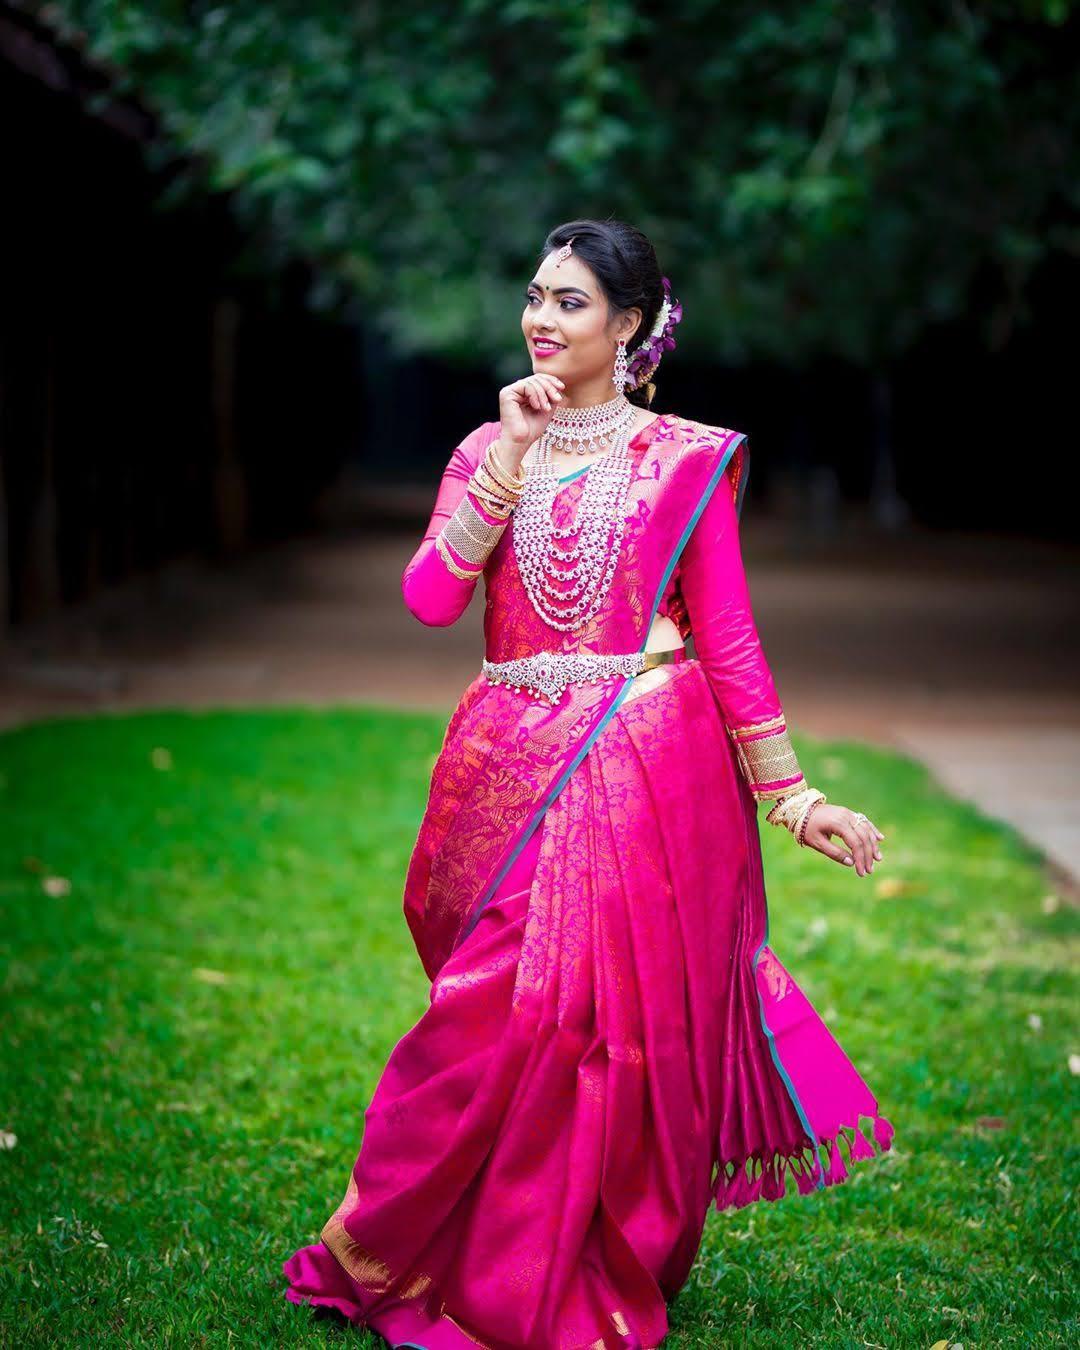 pavithra-janani-64697